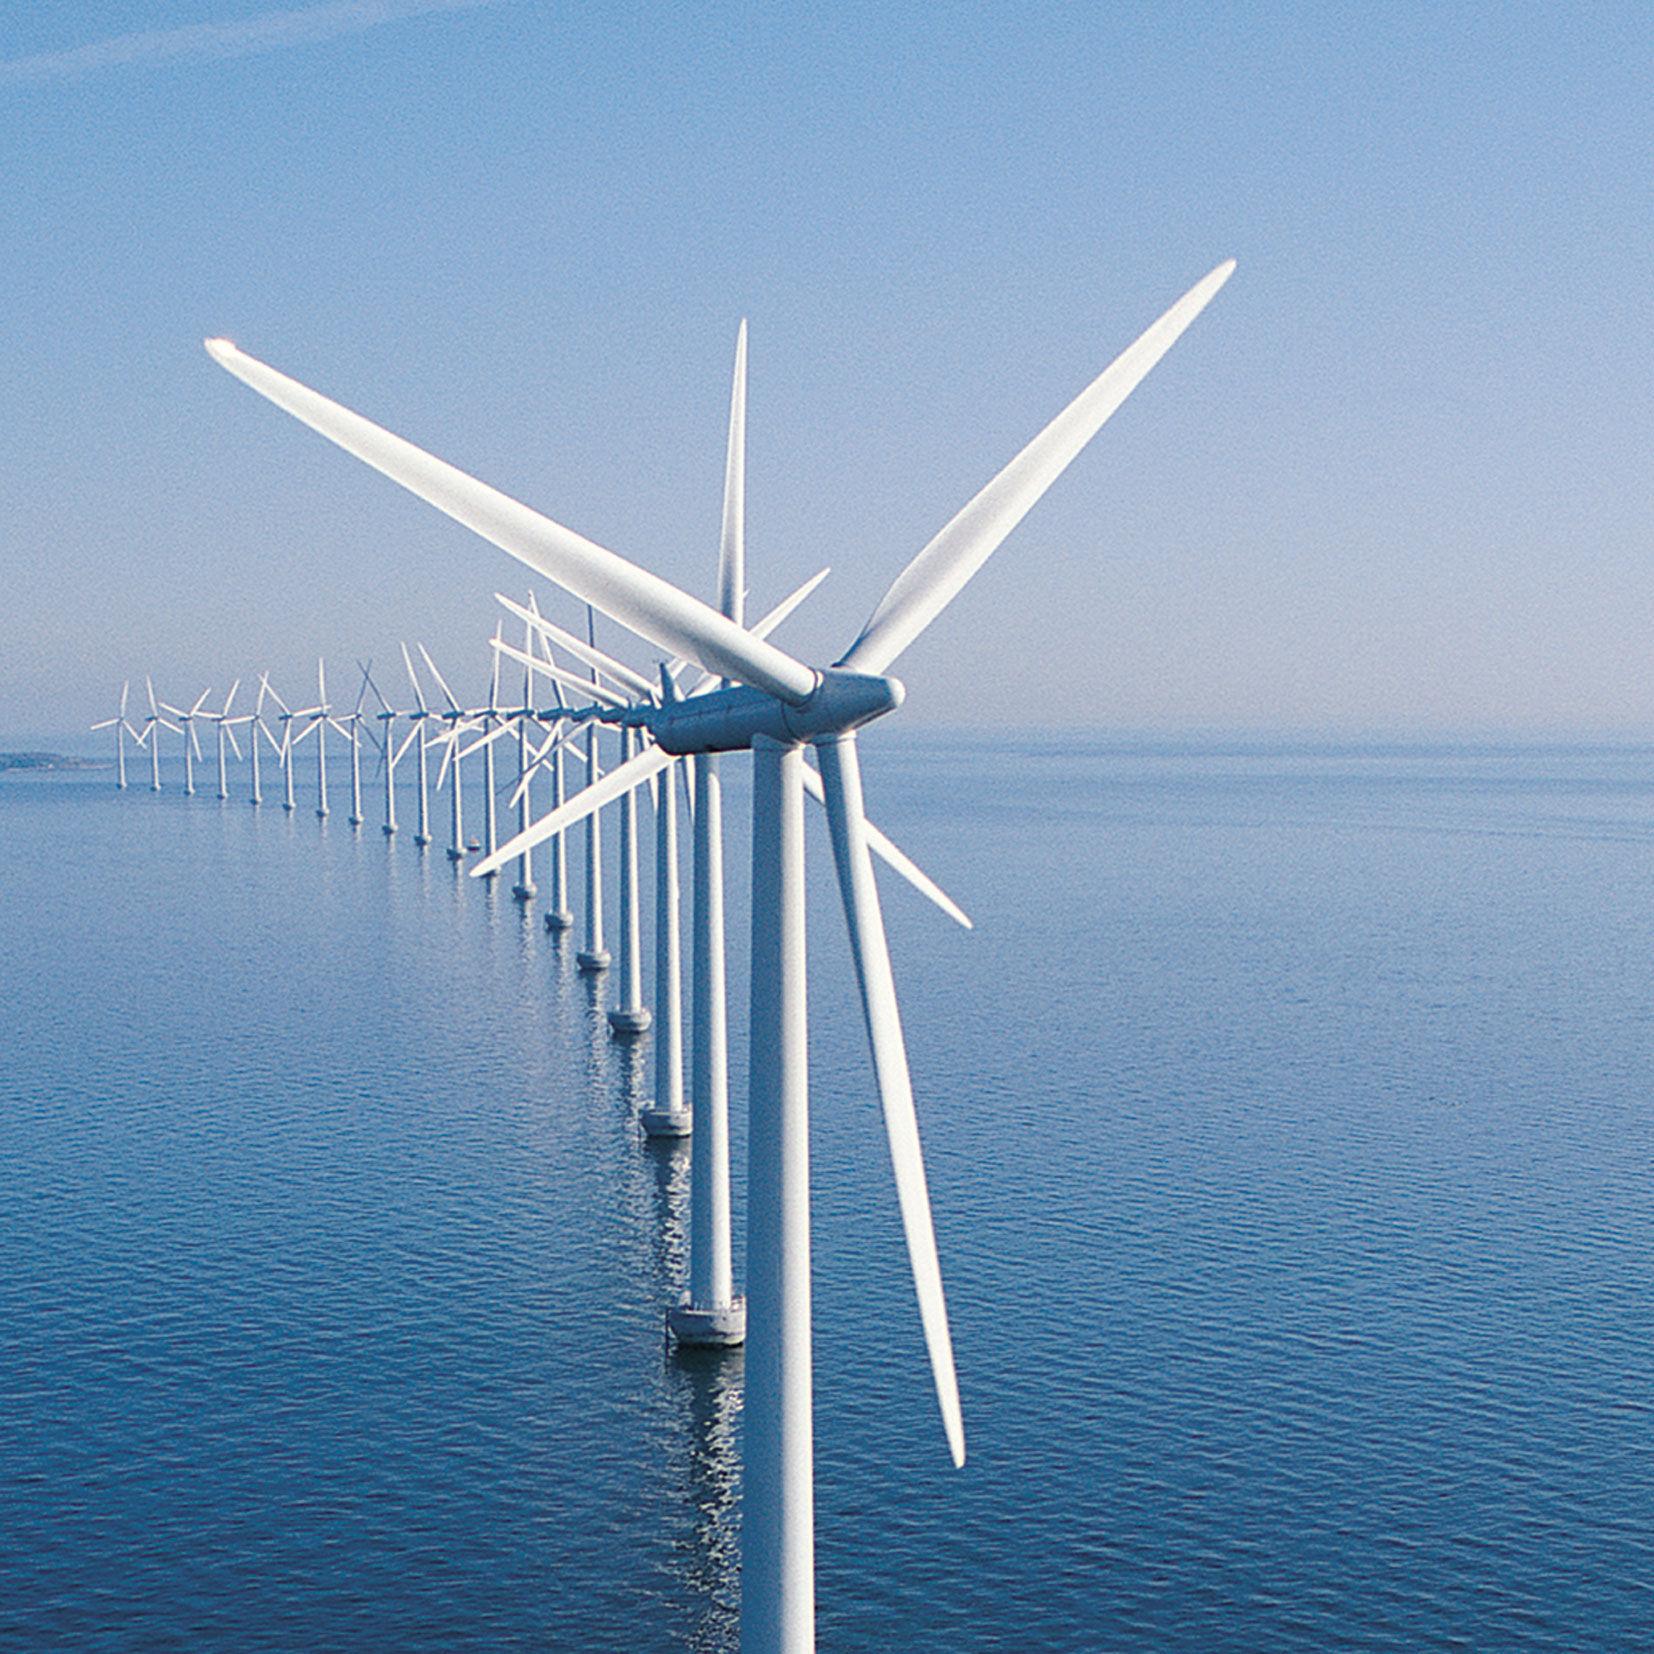 WindTurbine_Siemens.jpg